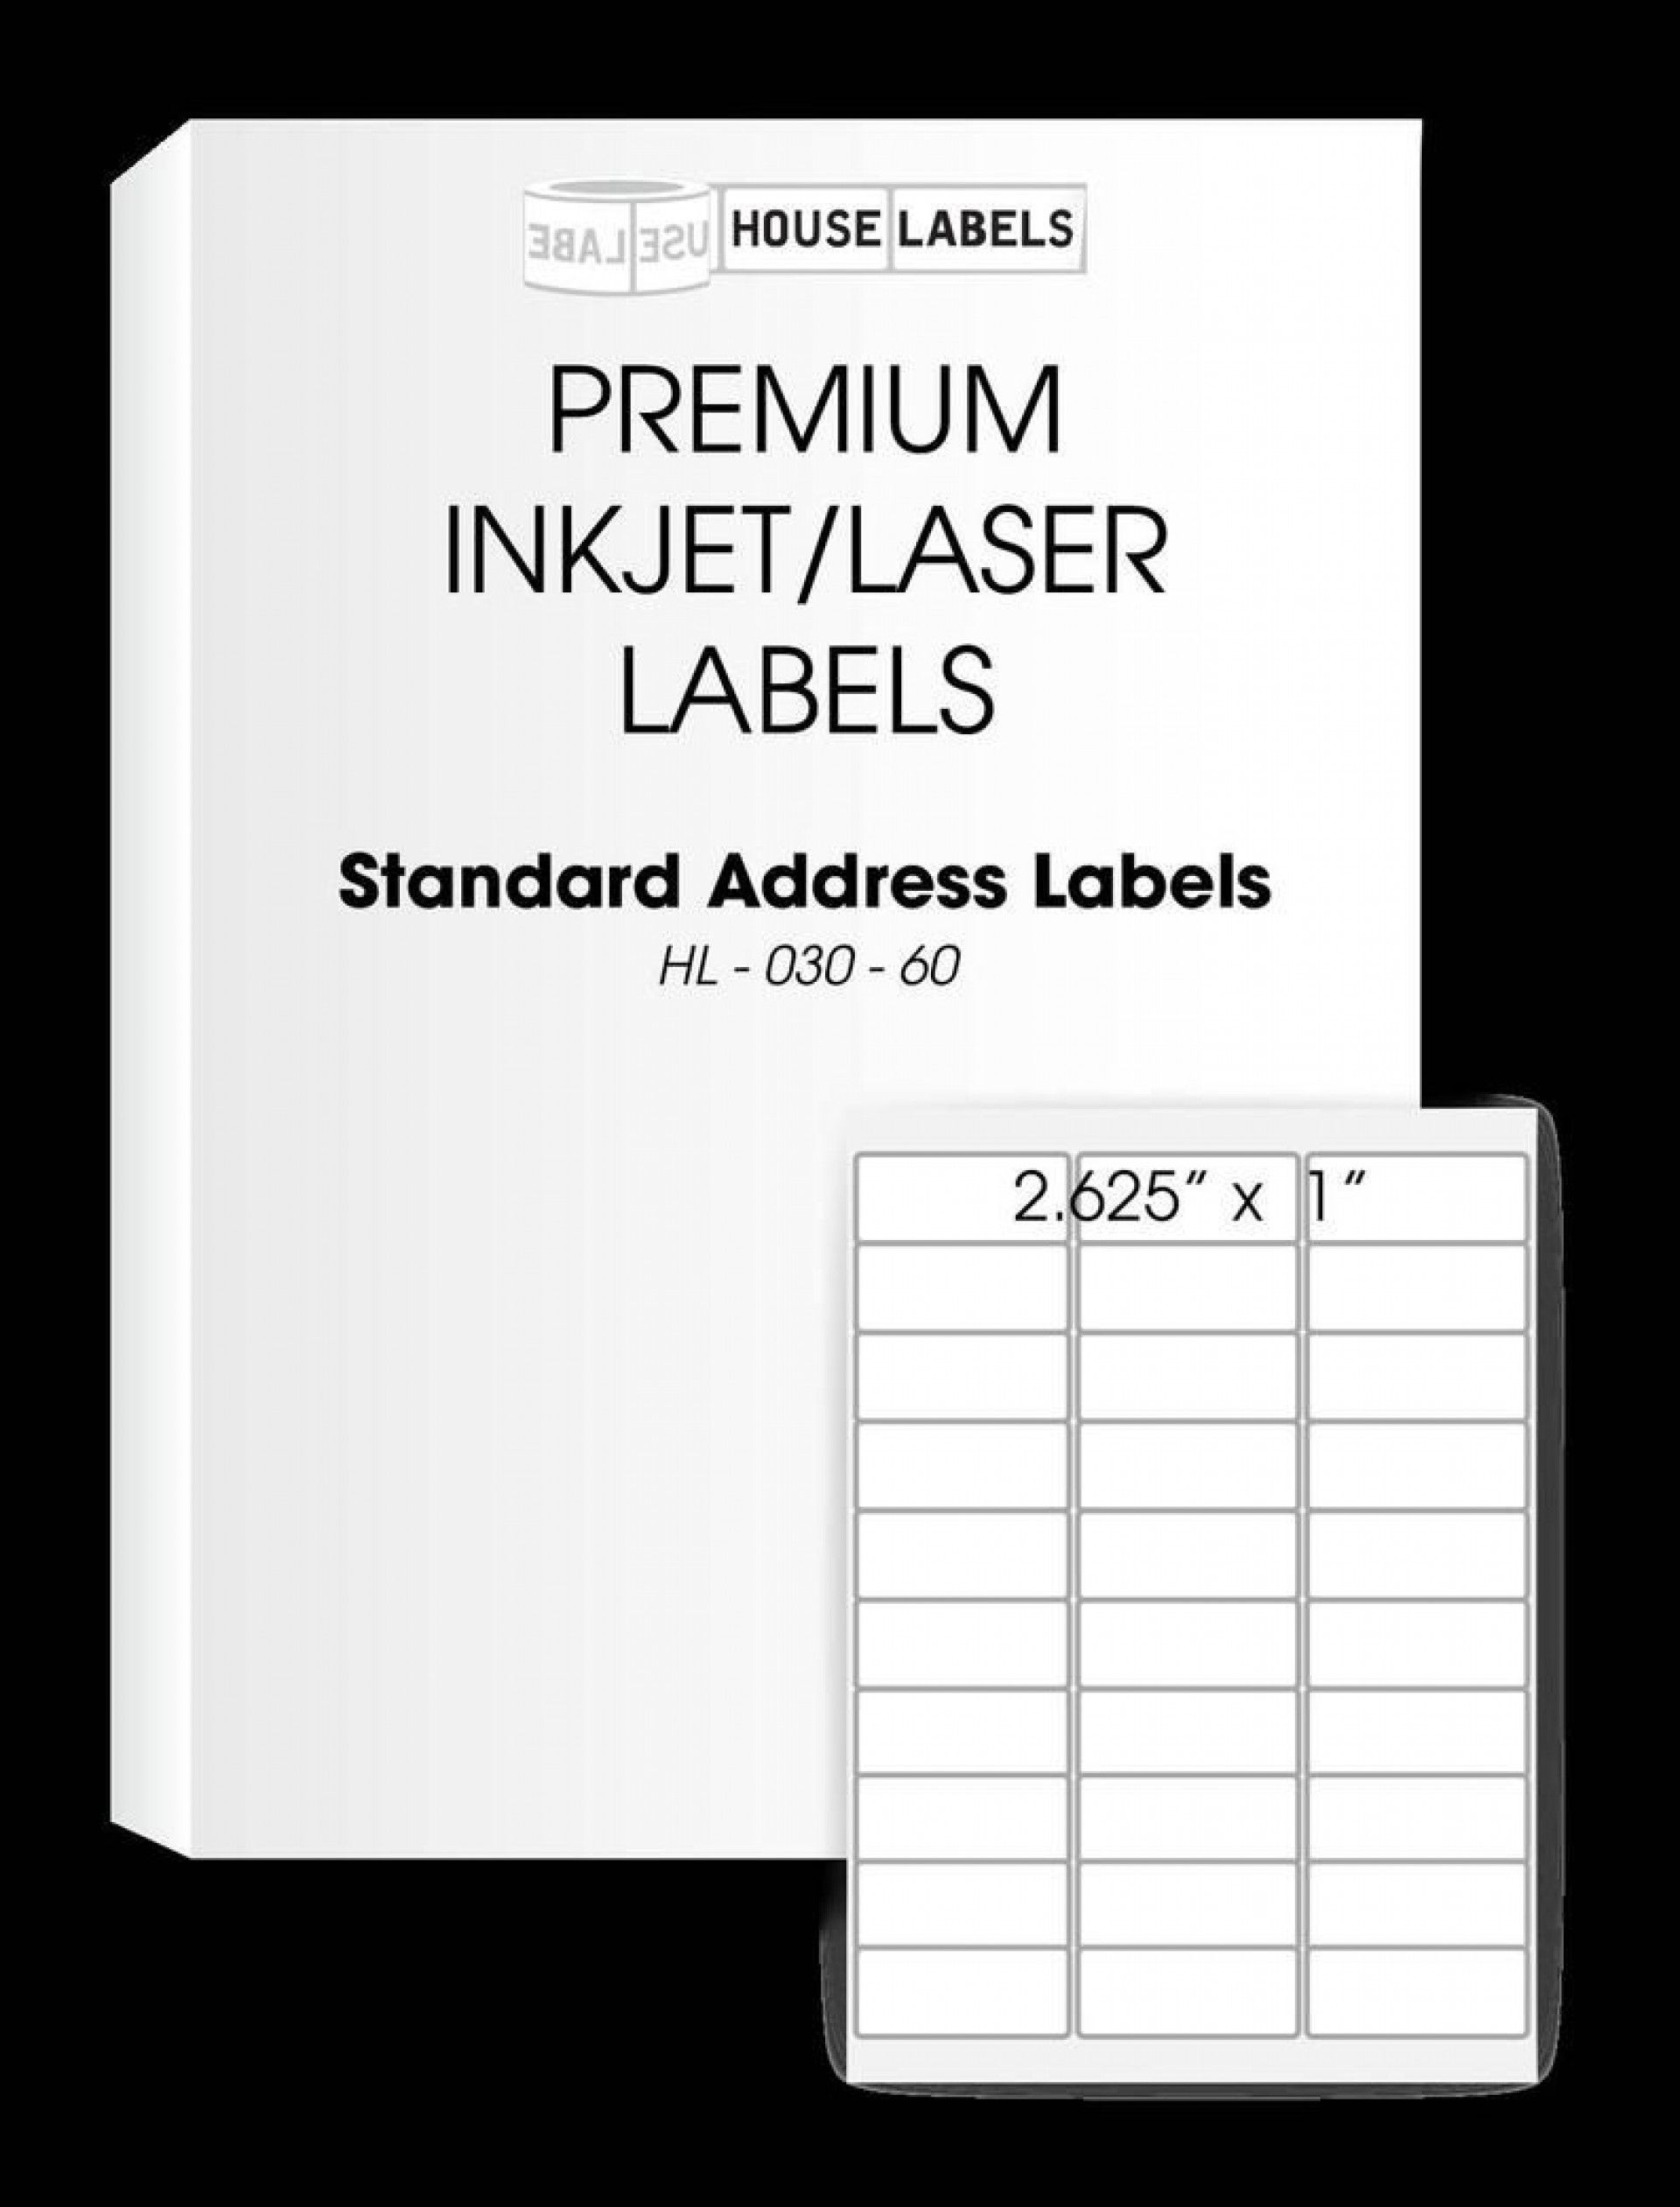 008 Unbelievable Free Return Addres Label Template 60 Per Sheet High Resolution 1920